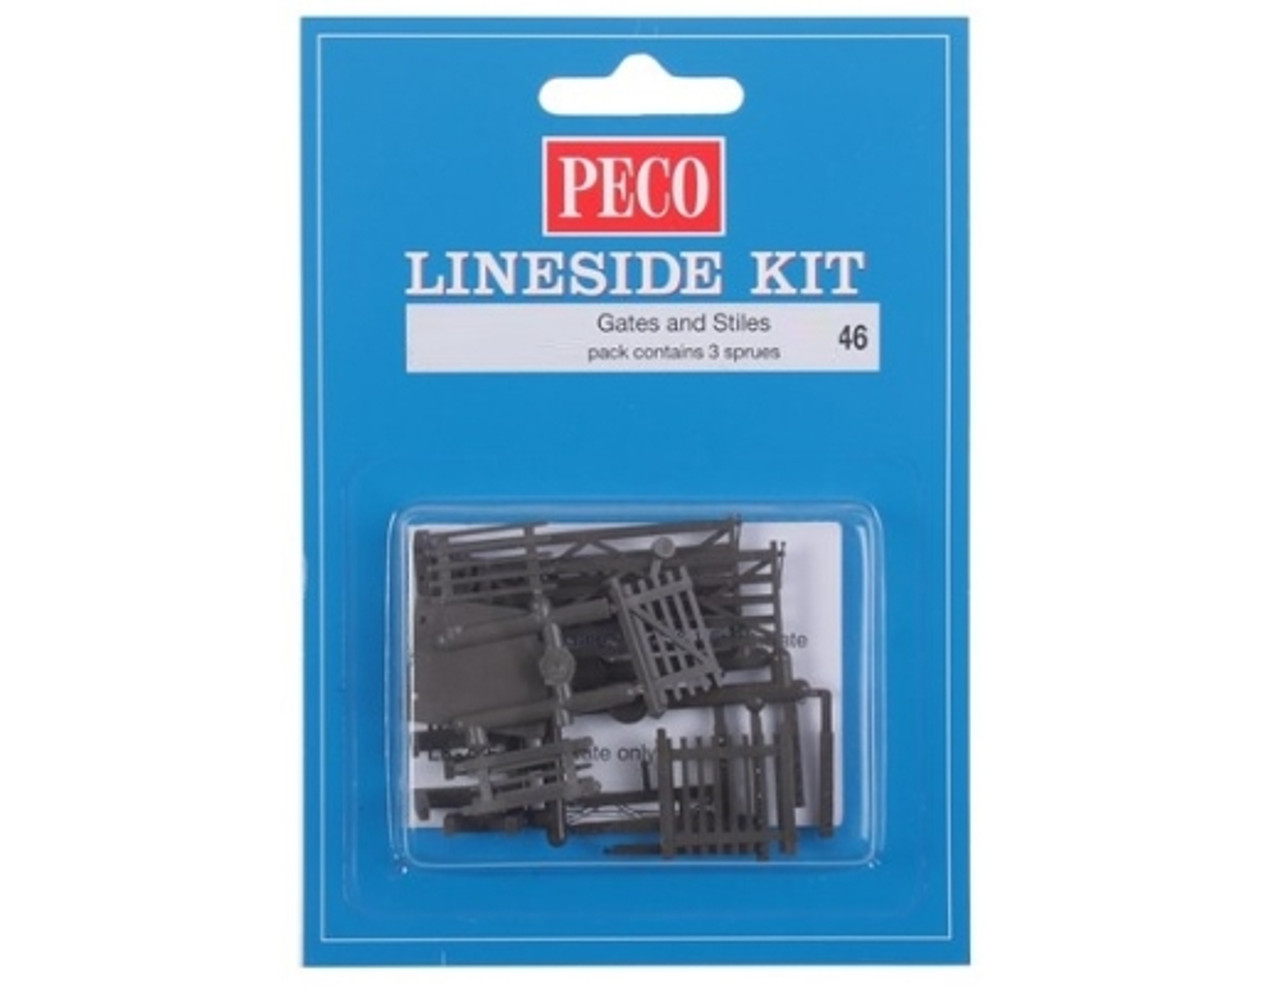 Peco NB-46 Lineside Kits 3 Field Gates, 3 Stiles a